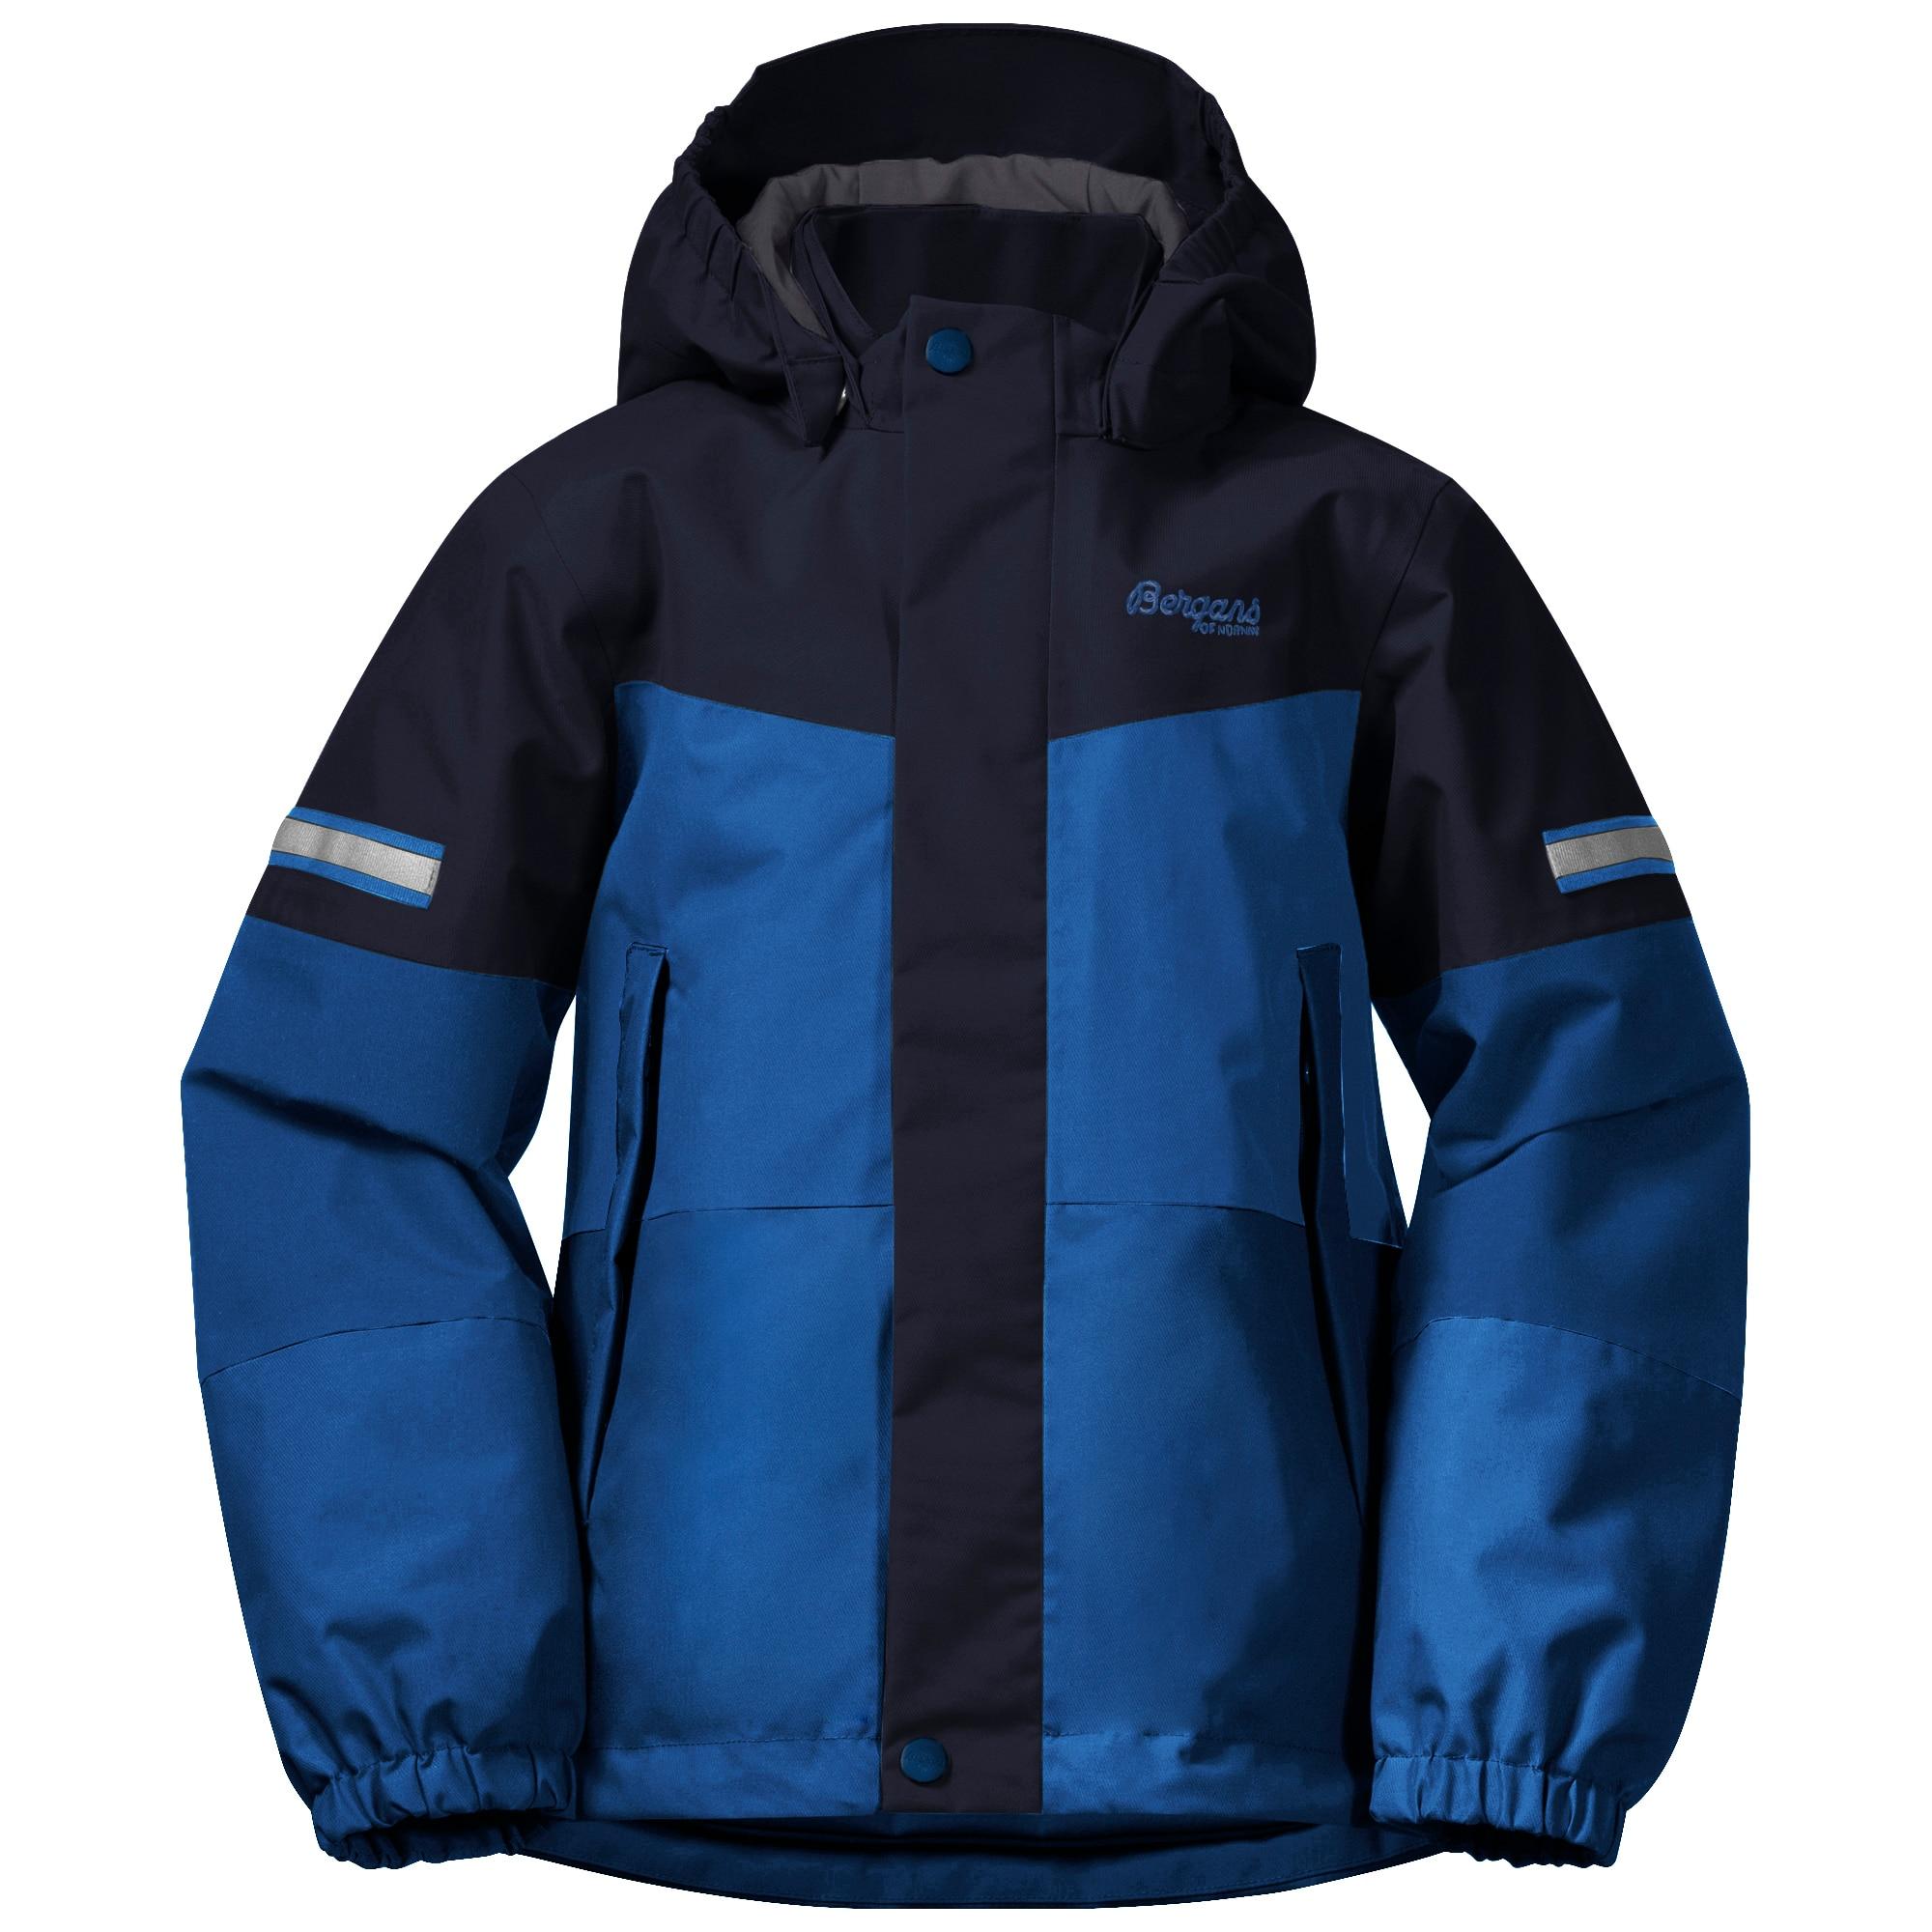 Lilletind Insulated Kids Jacket